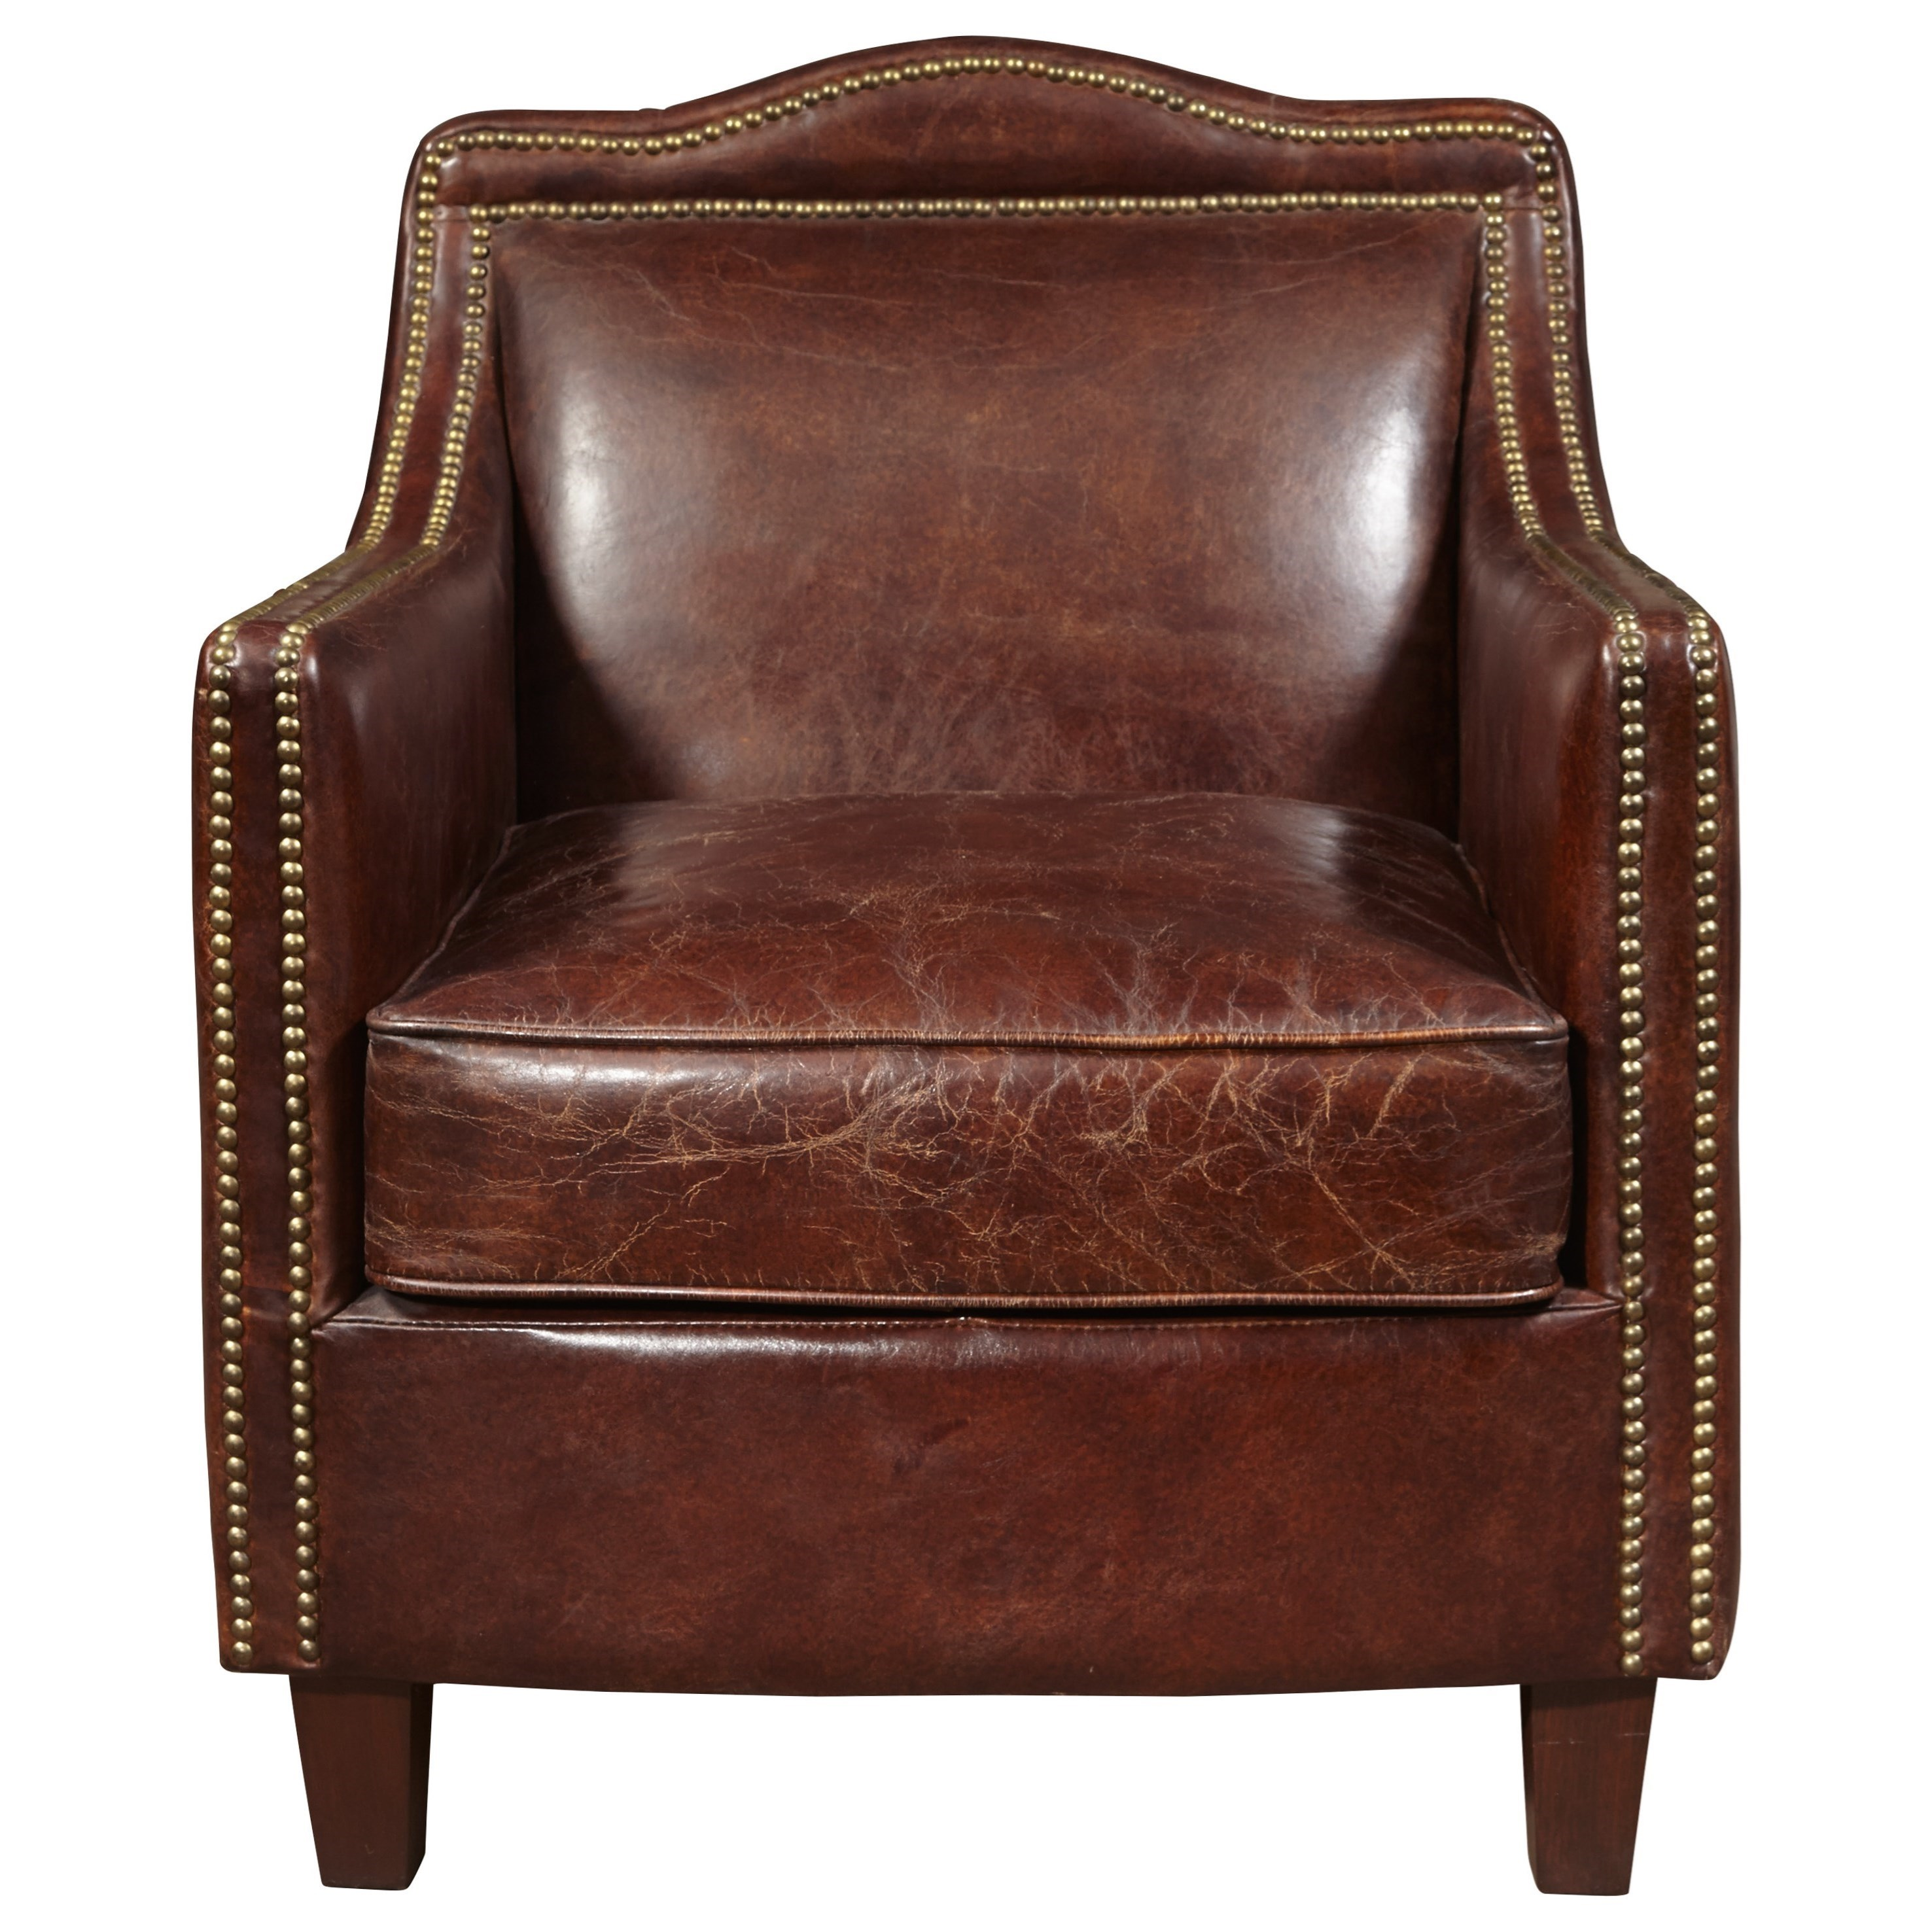 Pulaski Furniture Accent Chairs P006301 Danielle Arm Chair With Nail Head  Trim | John V Schultz Furniture | Upholstered Chairs